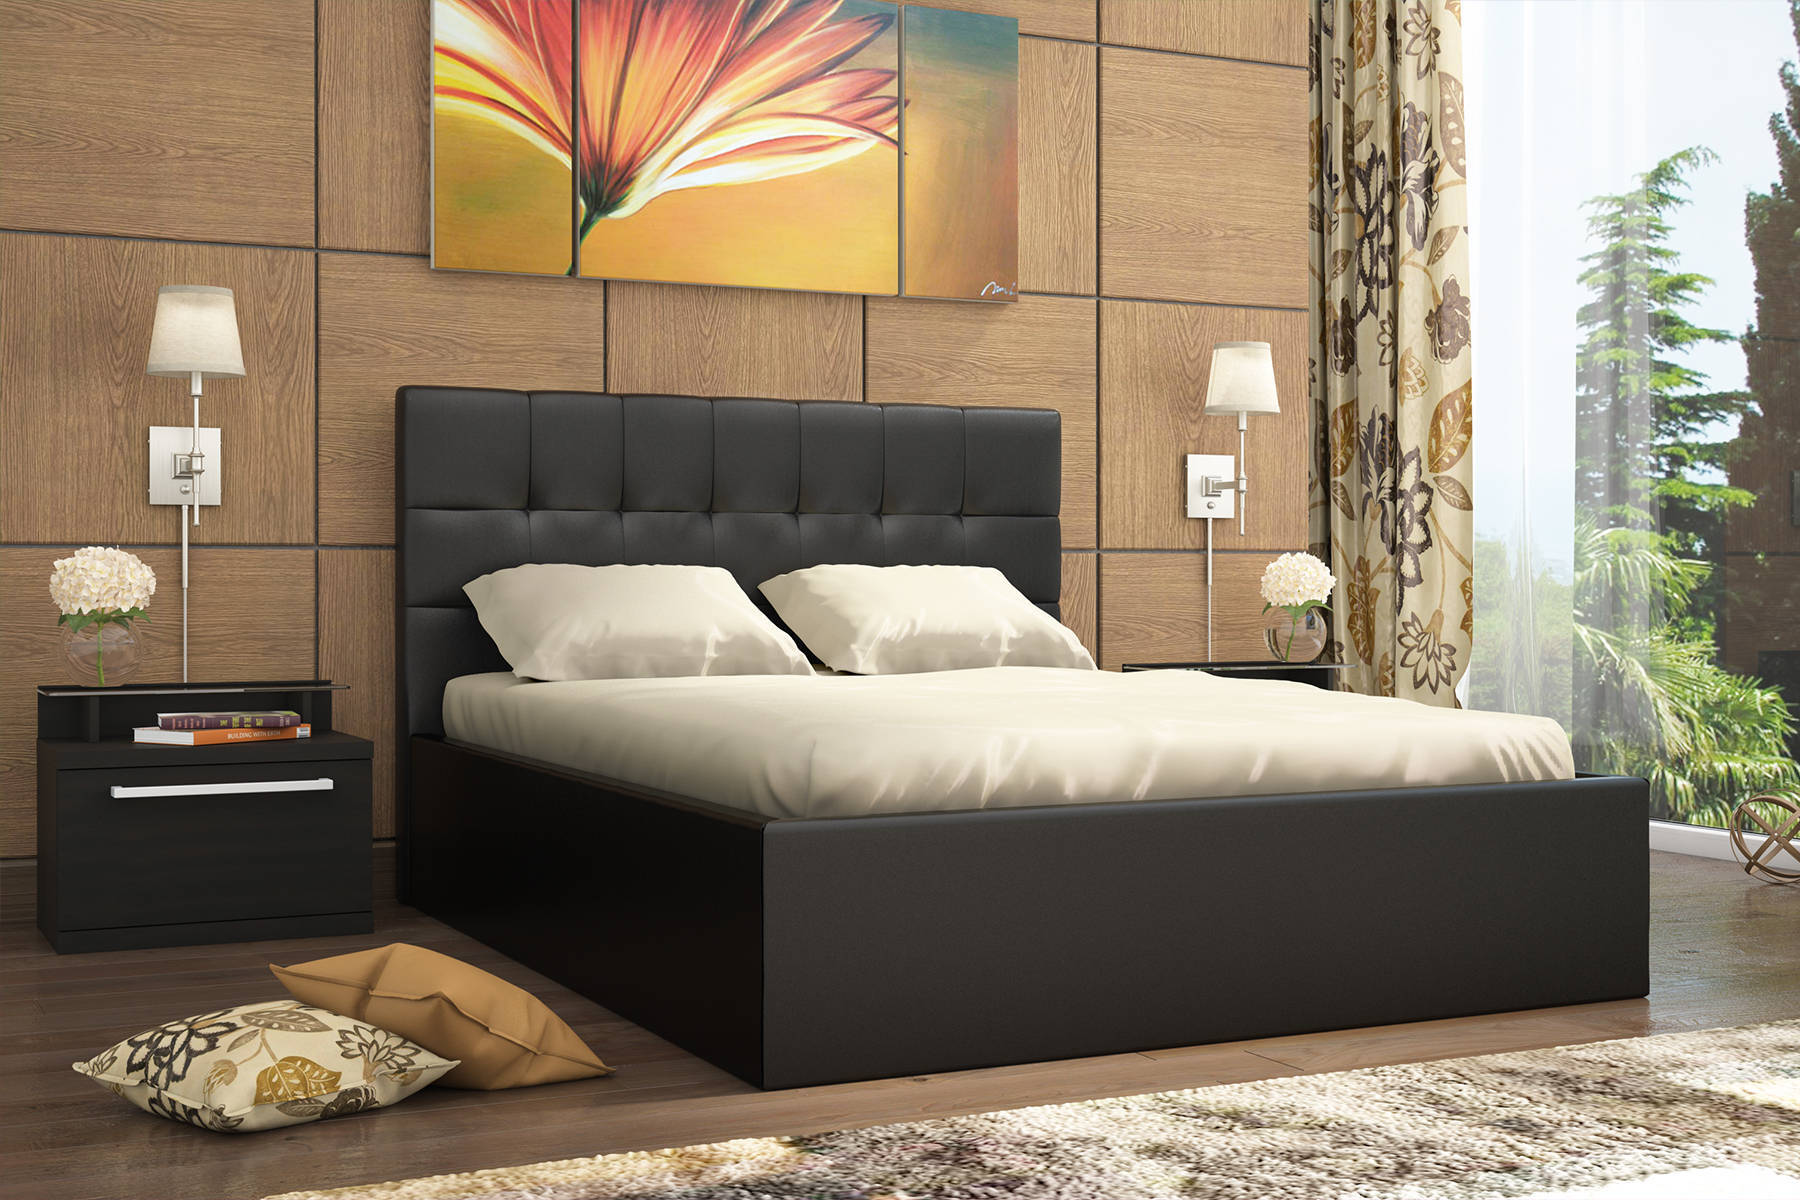 купить диван на авито краснодарский край